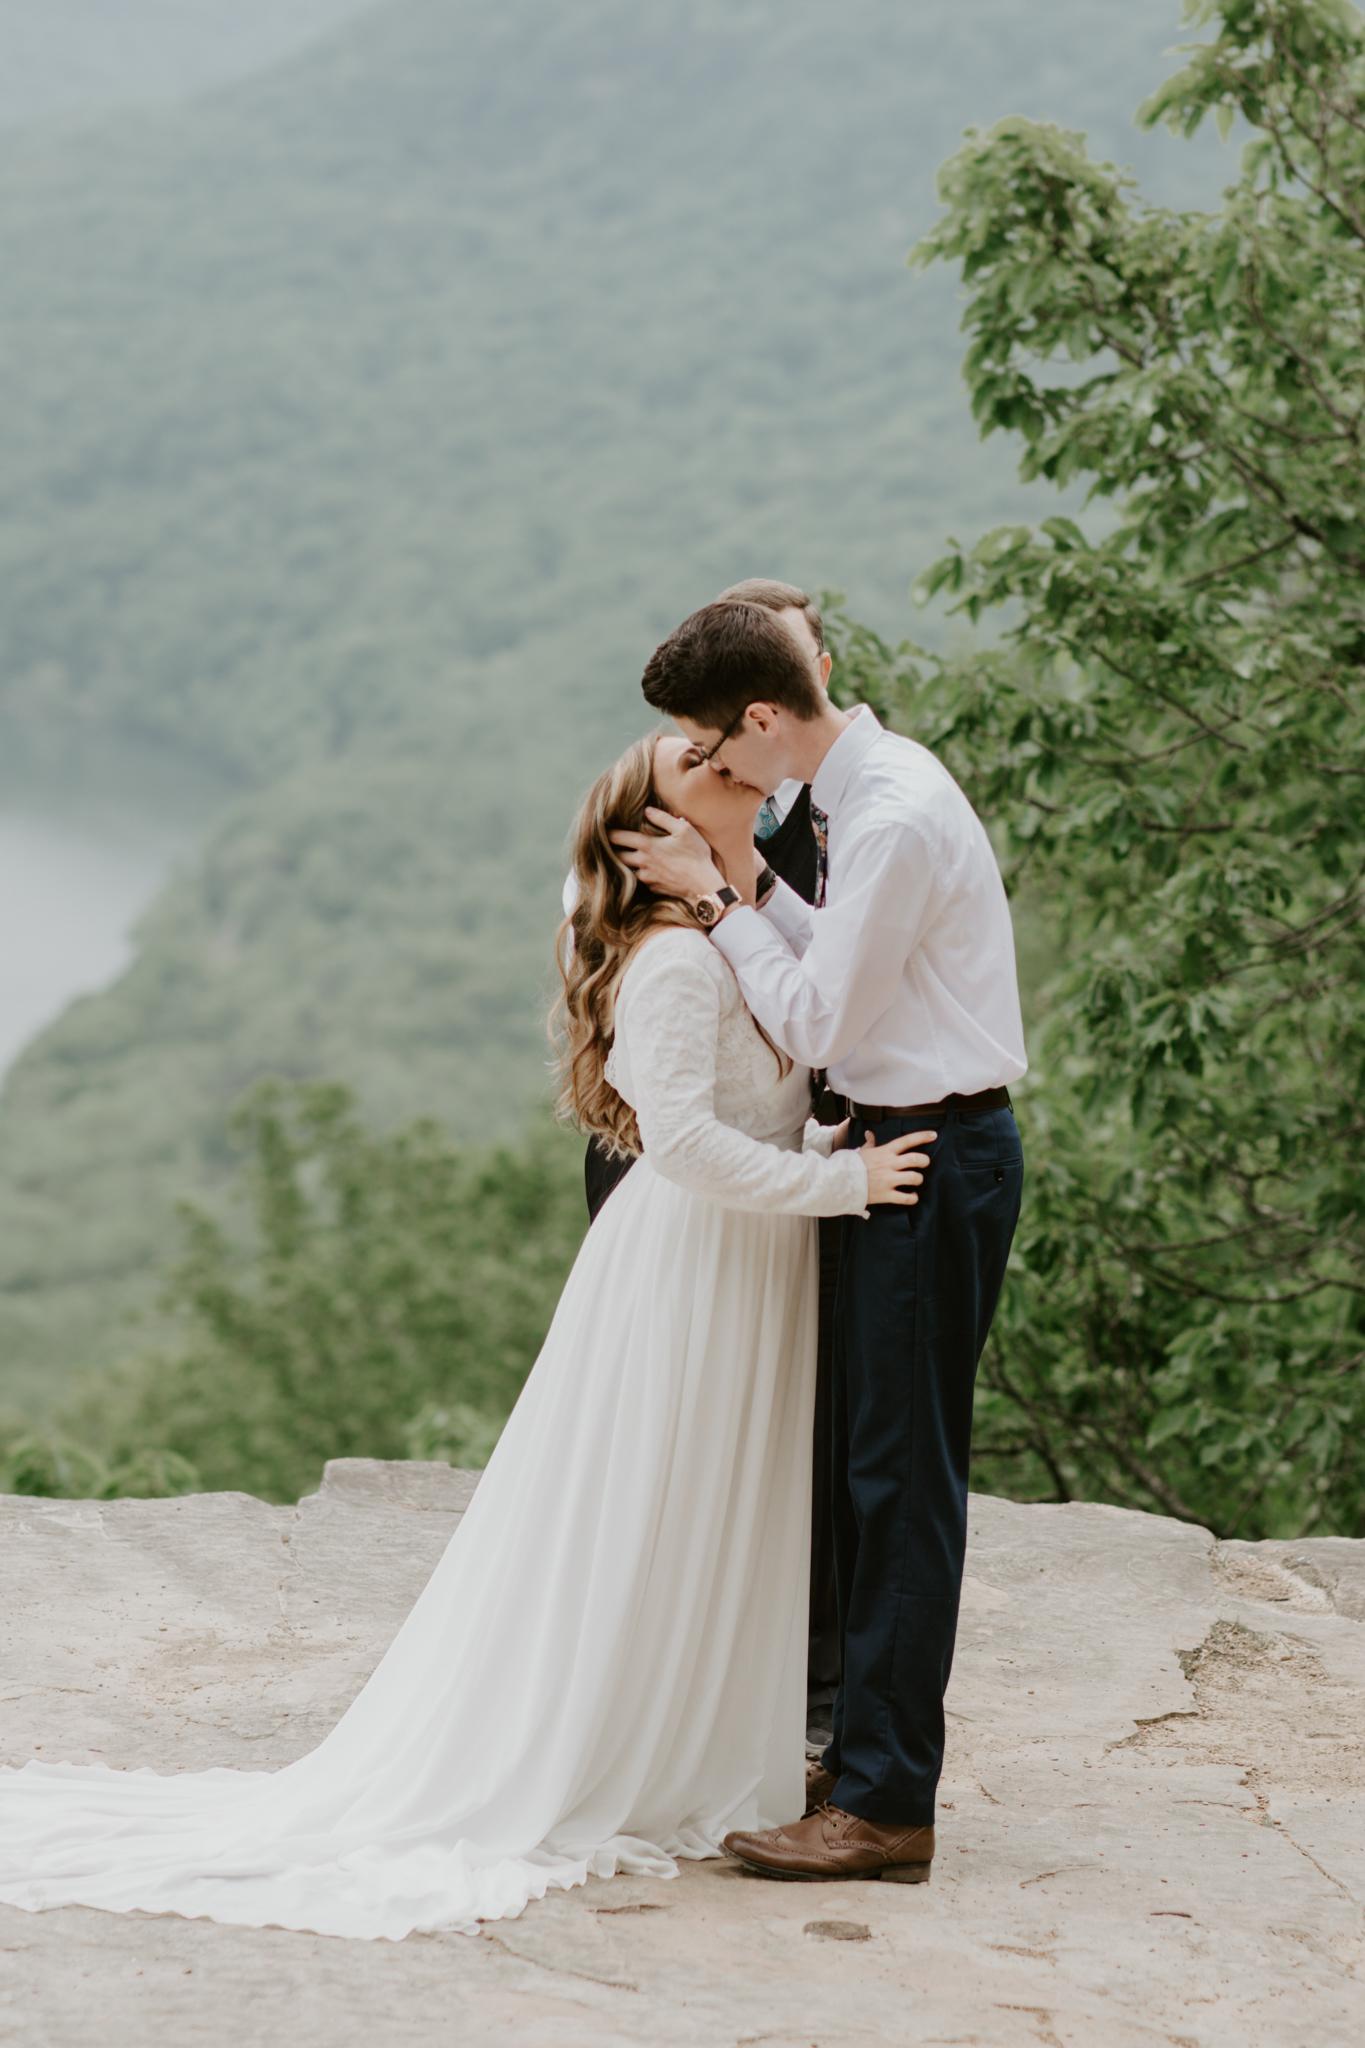 Lacey-Joe-Chattanooga-Nashville-Tennessee-Wedding-Elopement-Photographer-81.jpg